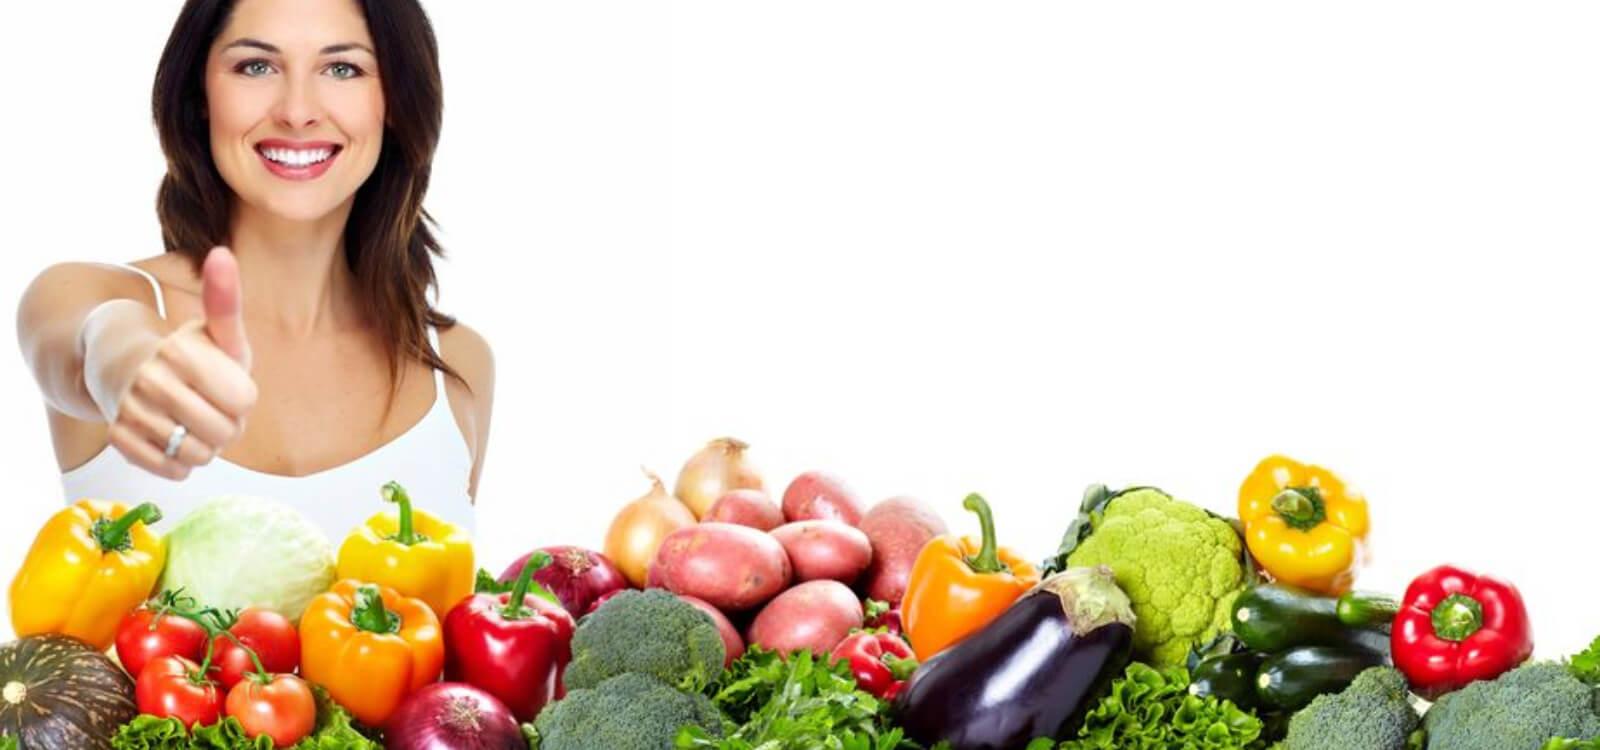 tom brady diet alkaline foods